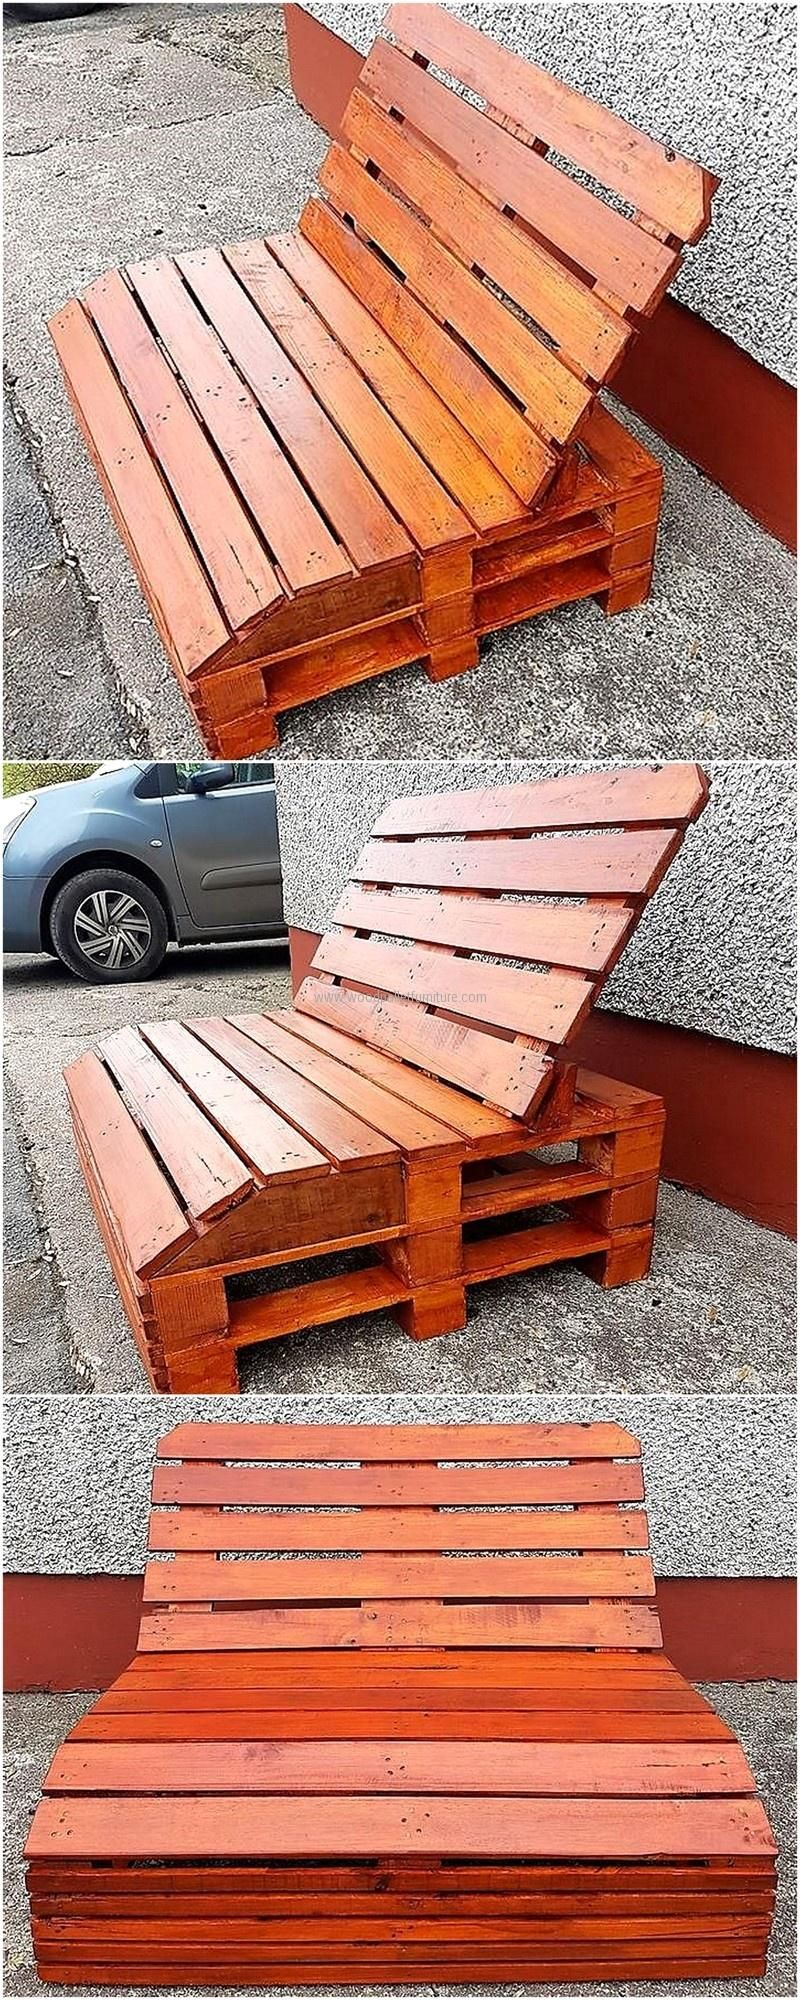 pallet garden seating idea | DIY | Pinterest | Muebles de jardin ...